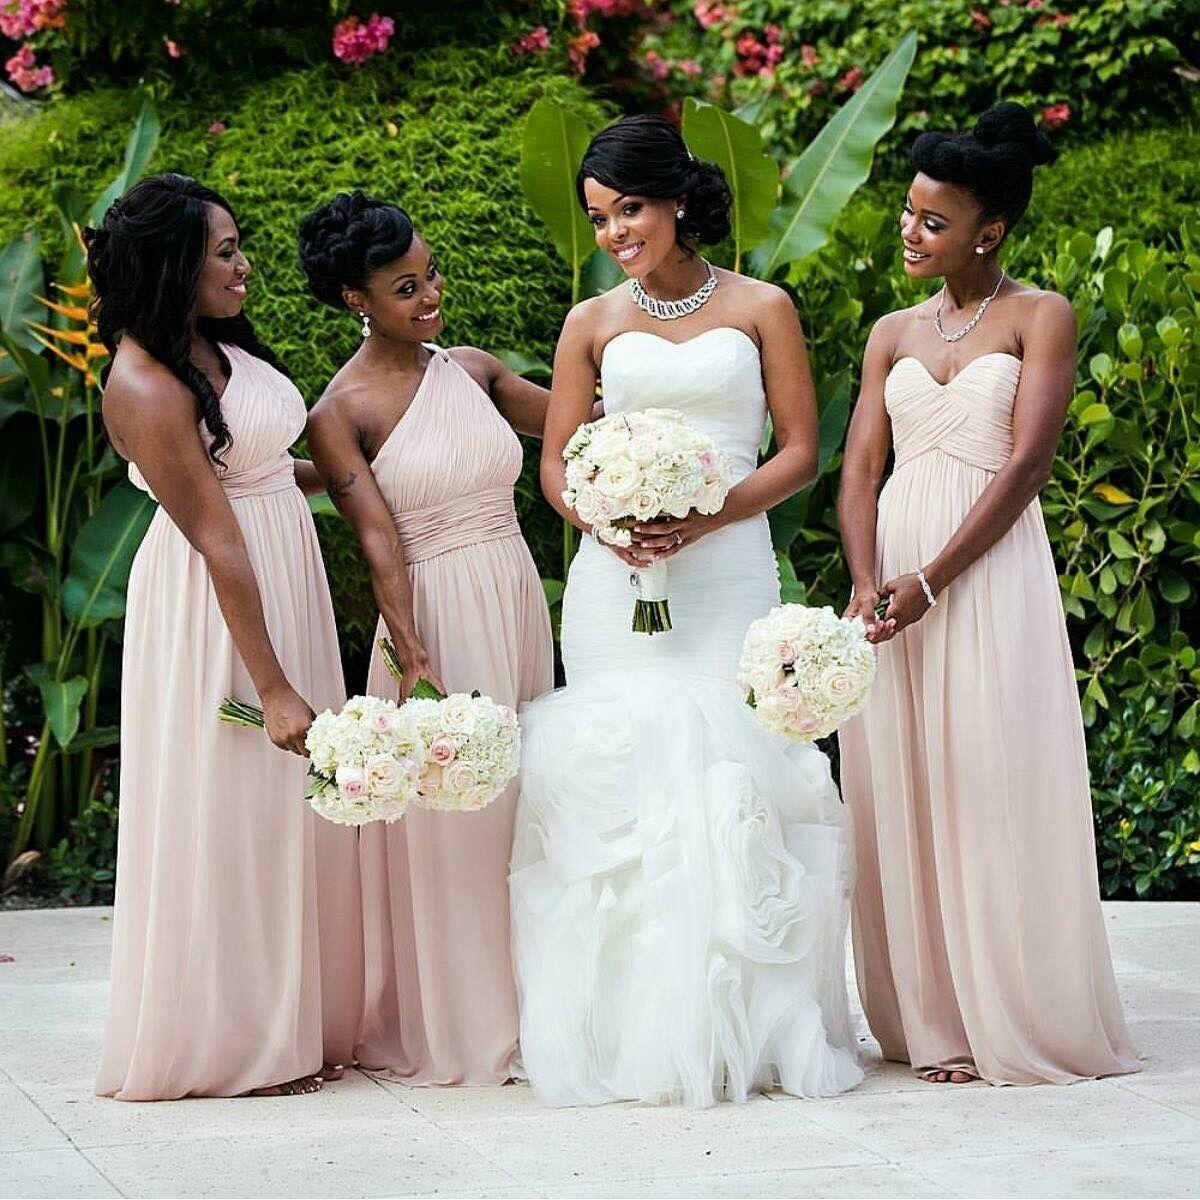 American Wedding Group.Pin By Alice Annum On Wedding Dresses Bridesmaid Dresses Wedding